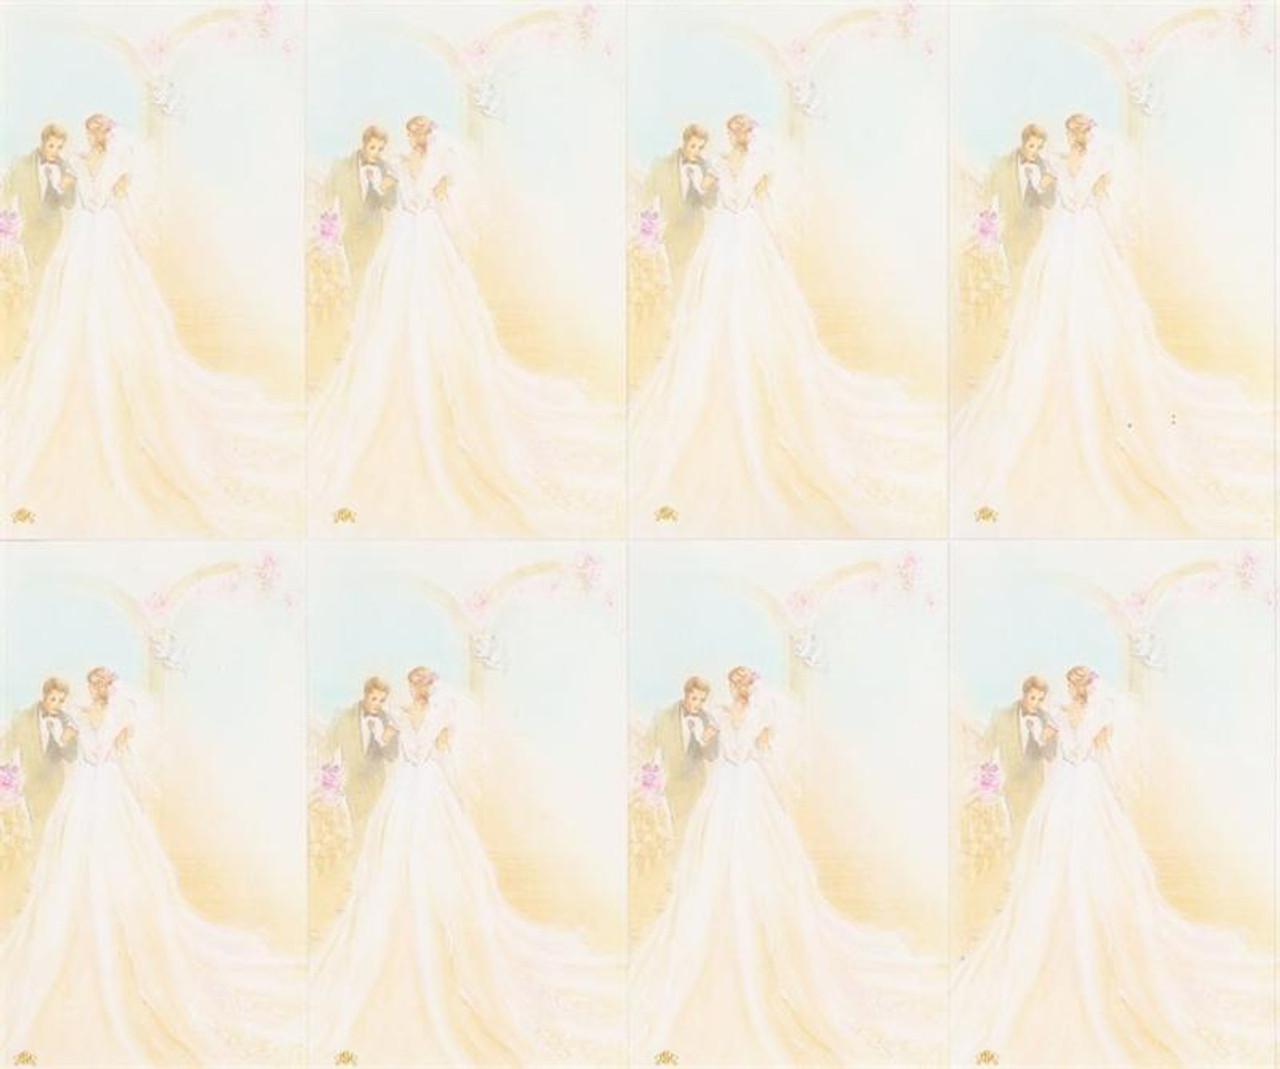 Custom Print Wedding - Bride and Groom Prayer Cards (Custom set of 8)